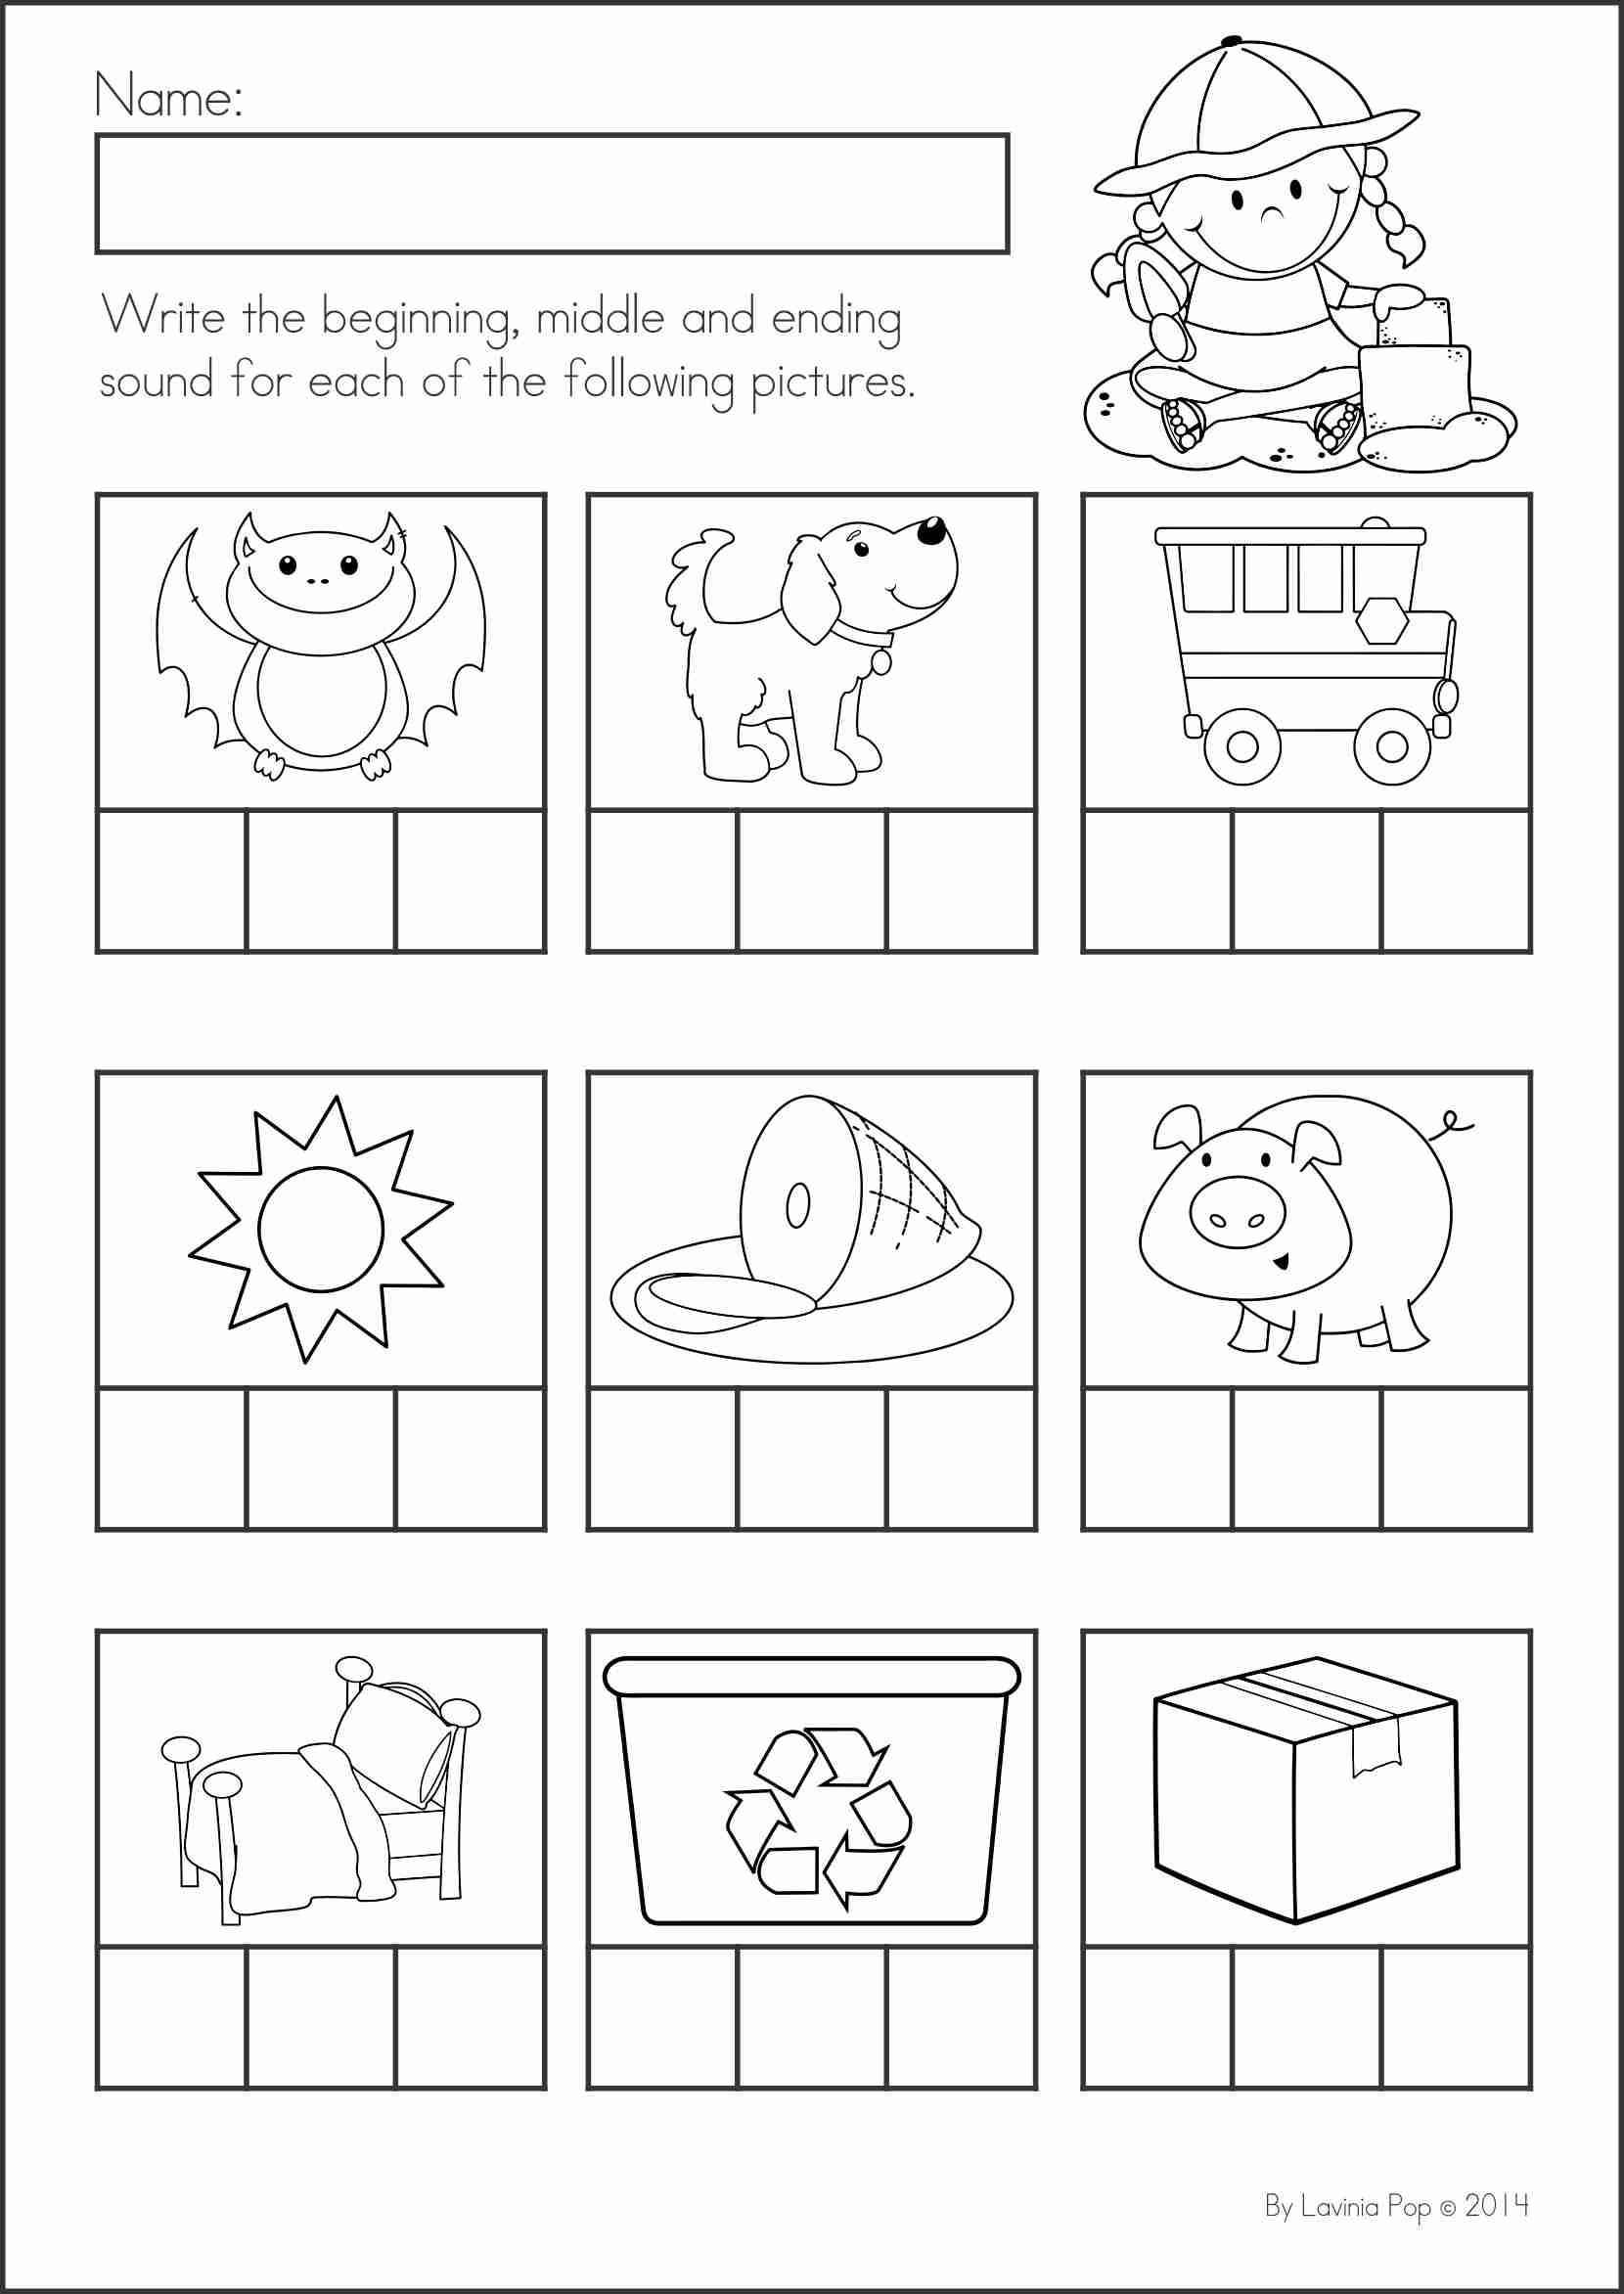 Cvc Worksheet Kindergarten Unique Writing Cvc Words Worksheet